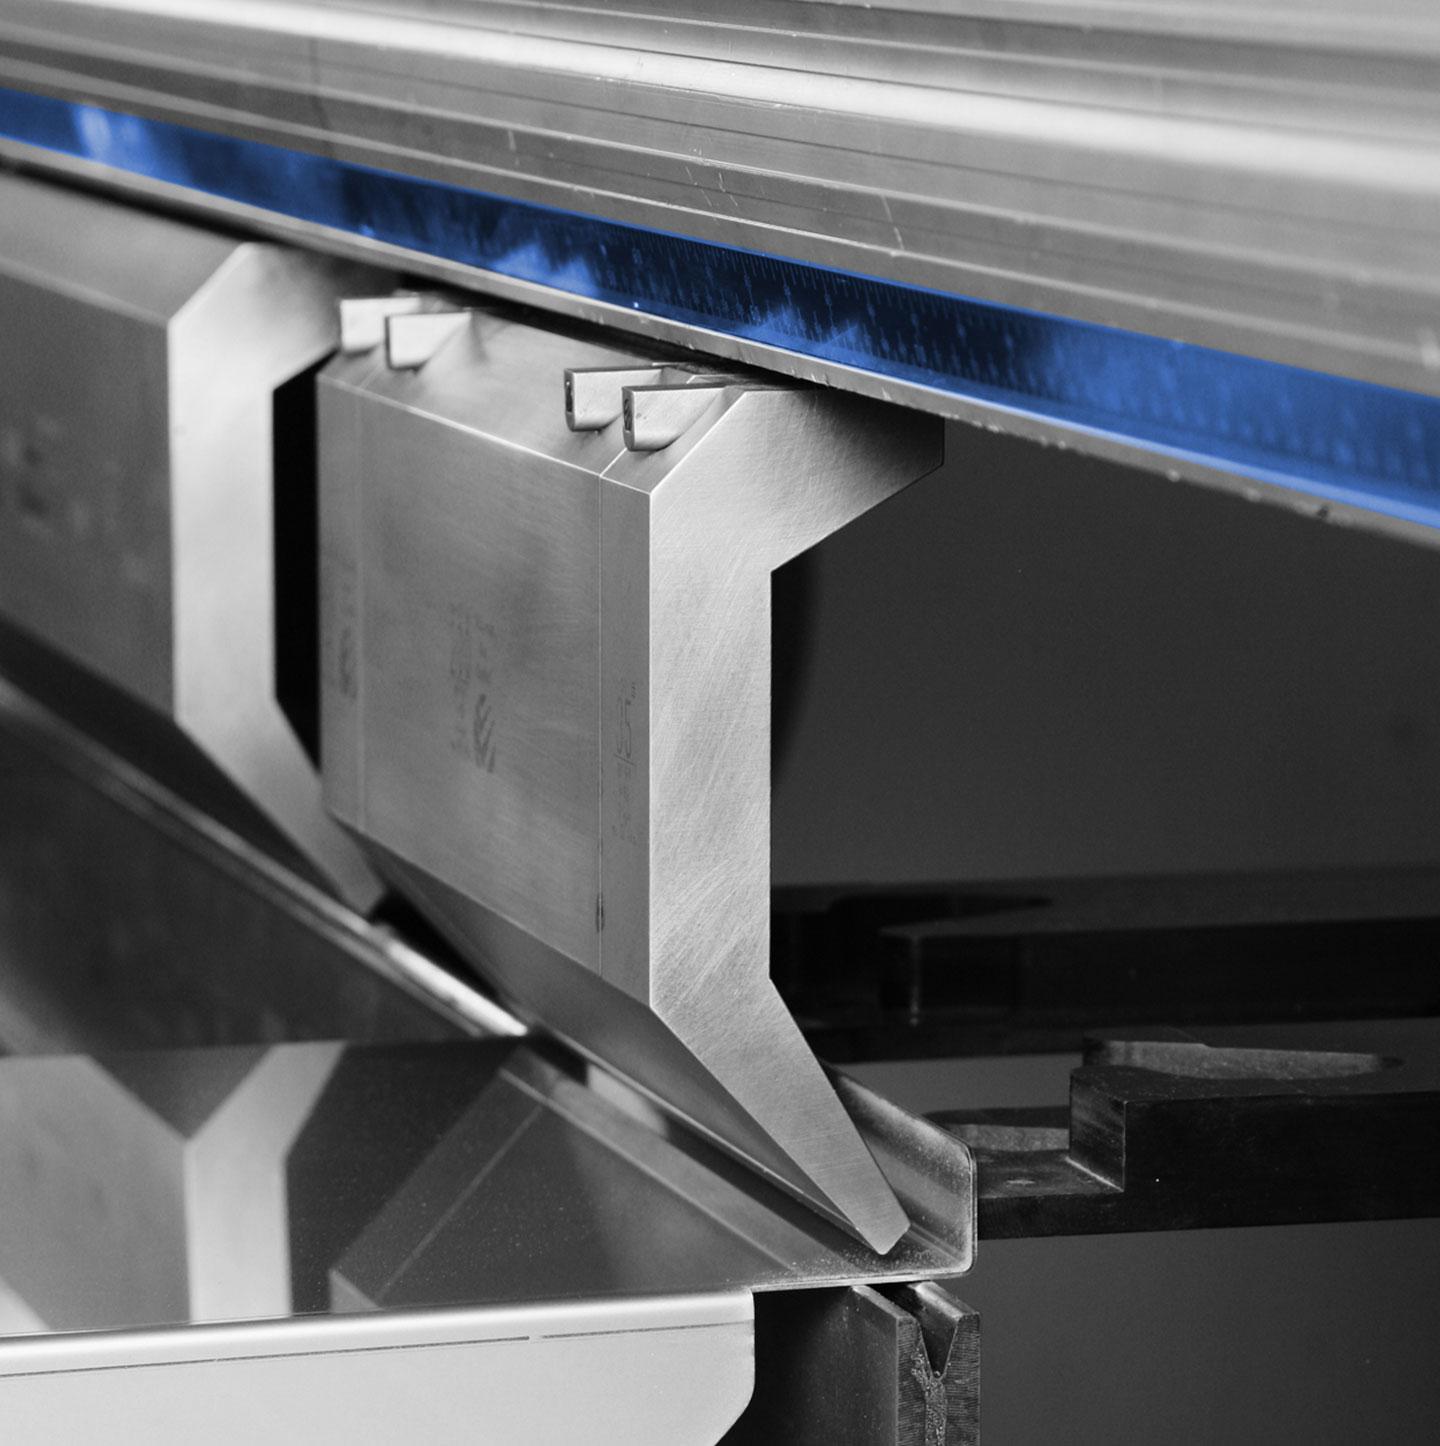 CNC Metal Pressing and Folding